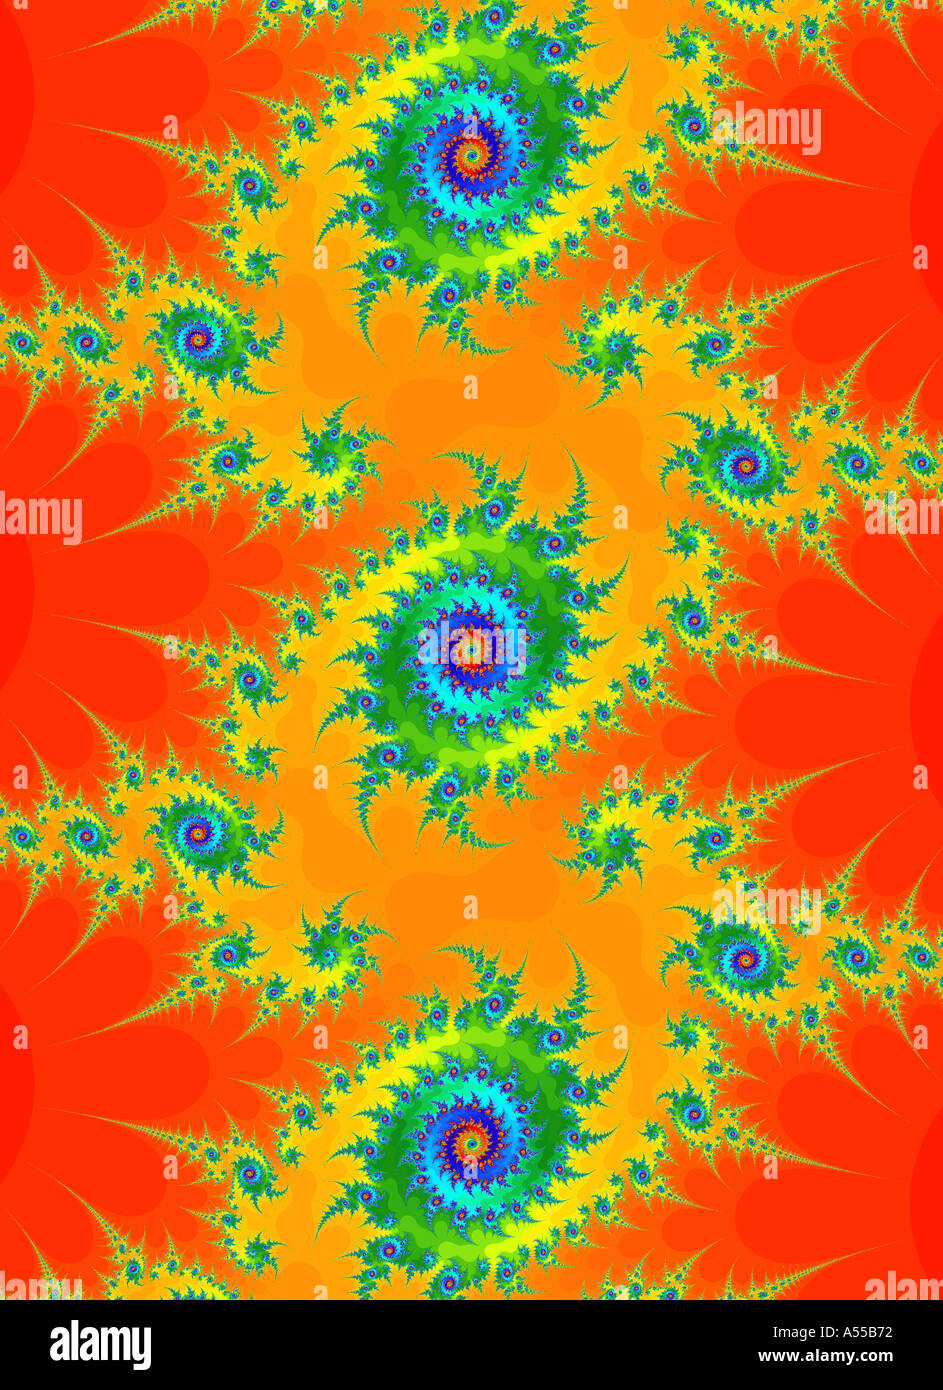 digital enhancement fractal - Stock Image